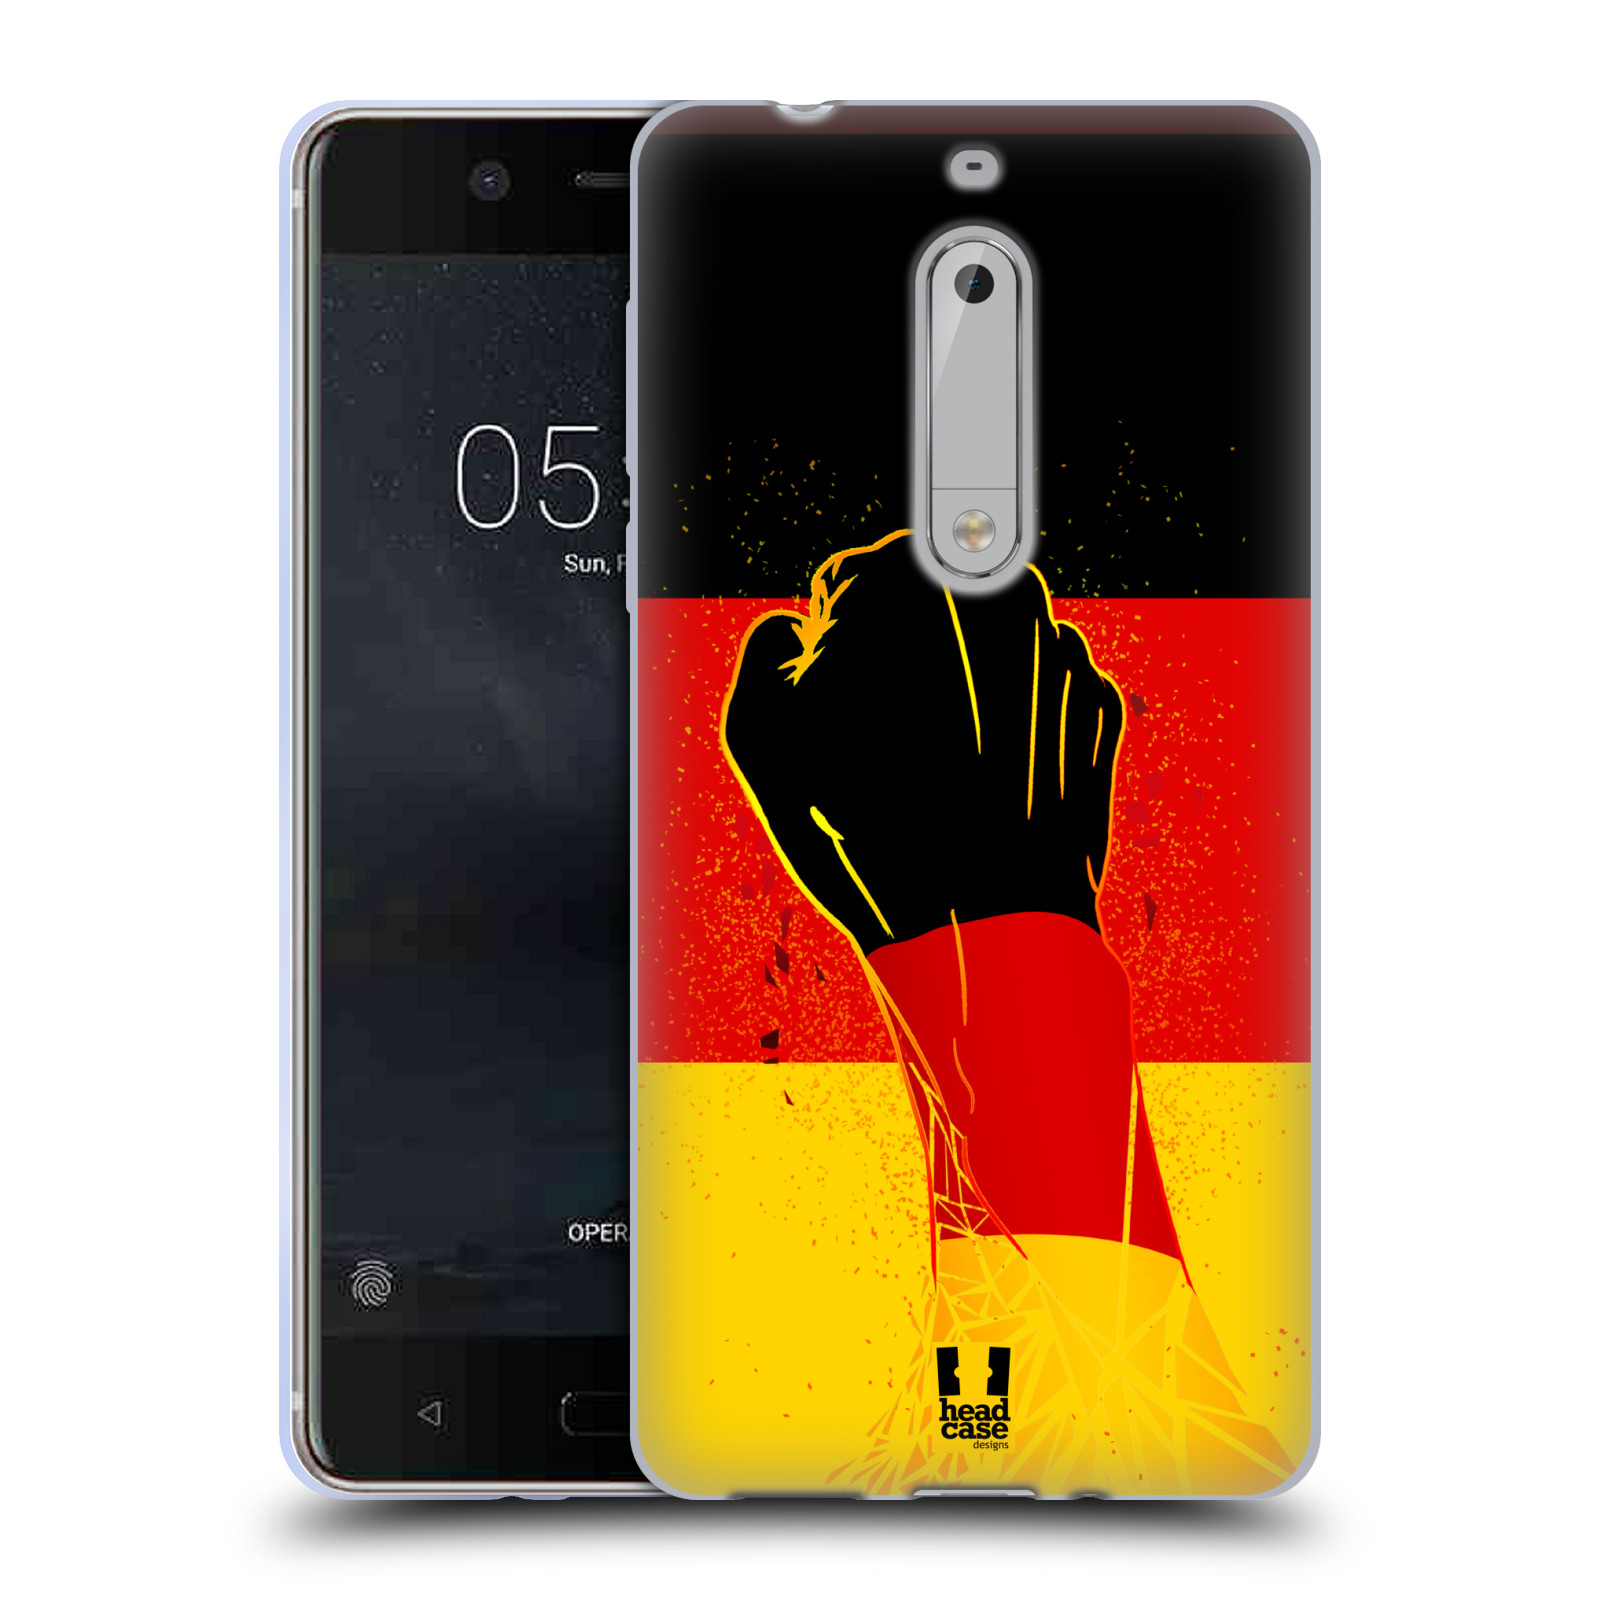 HEAD CASE silikonový obal na mobil Nokia 5 Sport fotbal fanoušek ruka